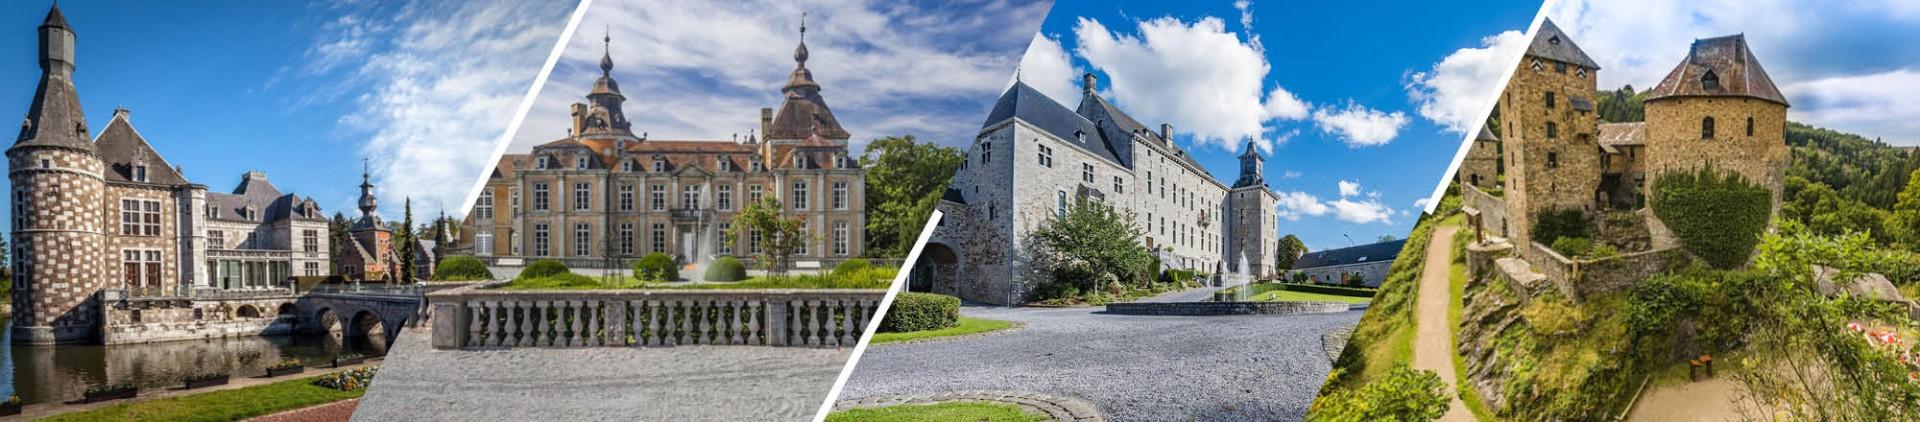 Castles in Liège province